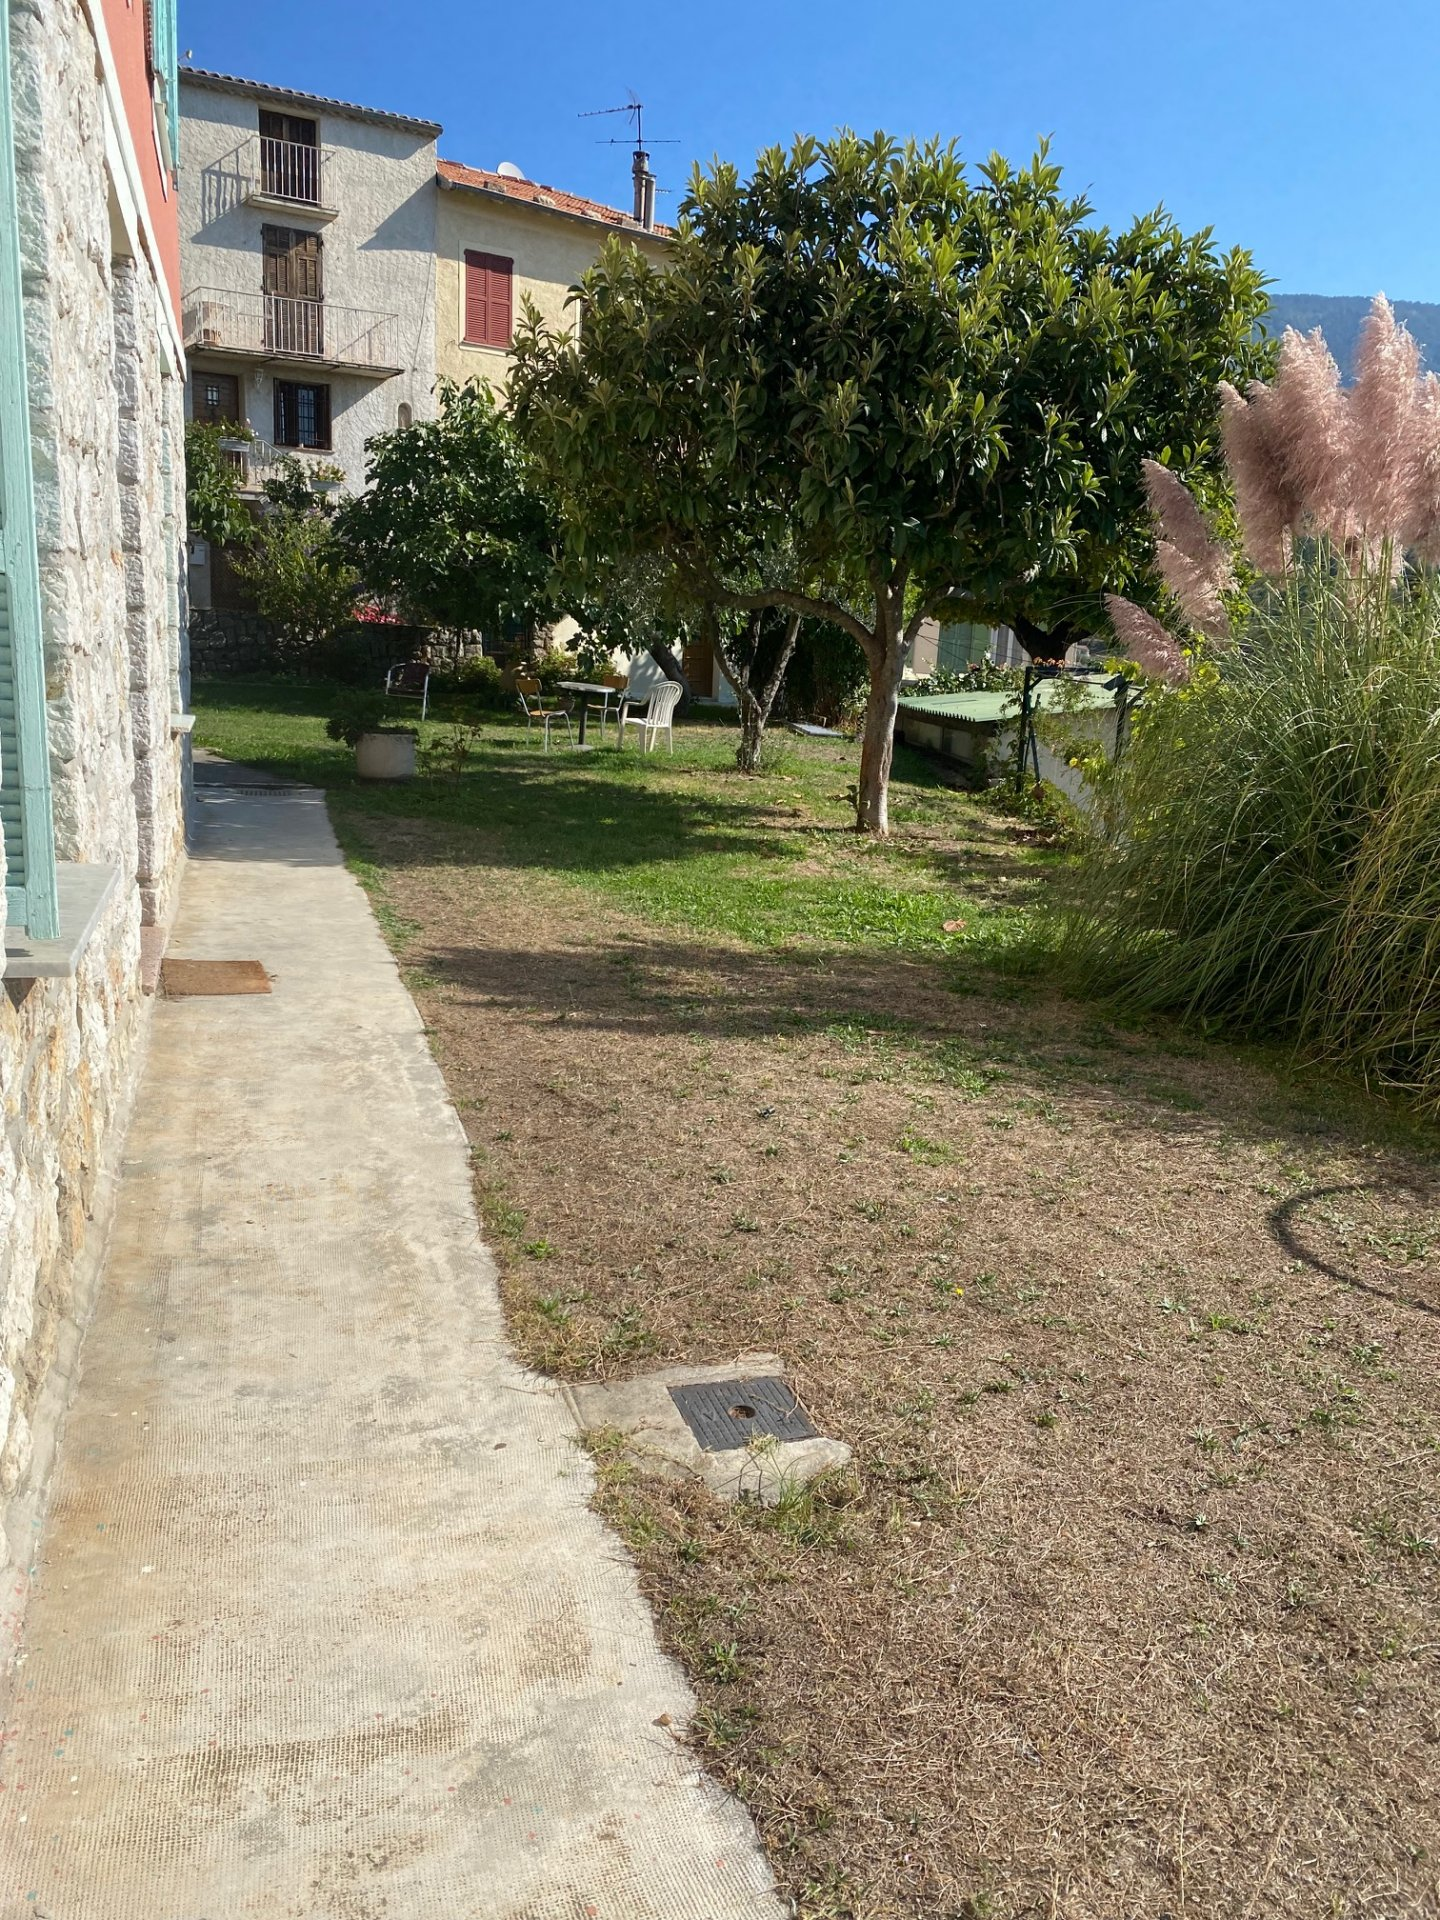 Levens village